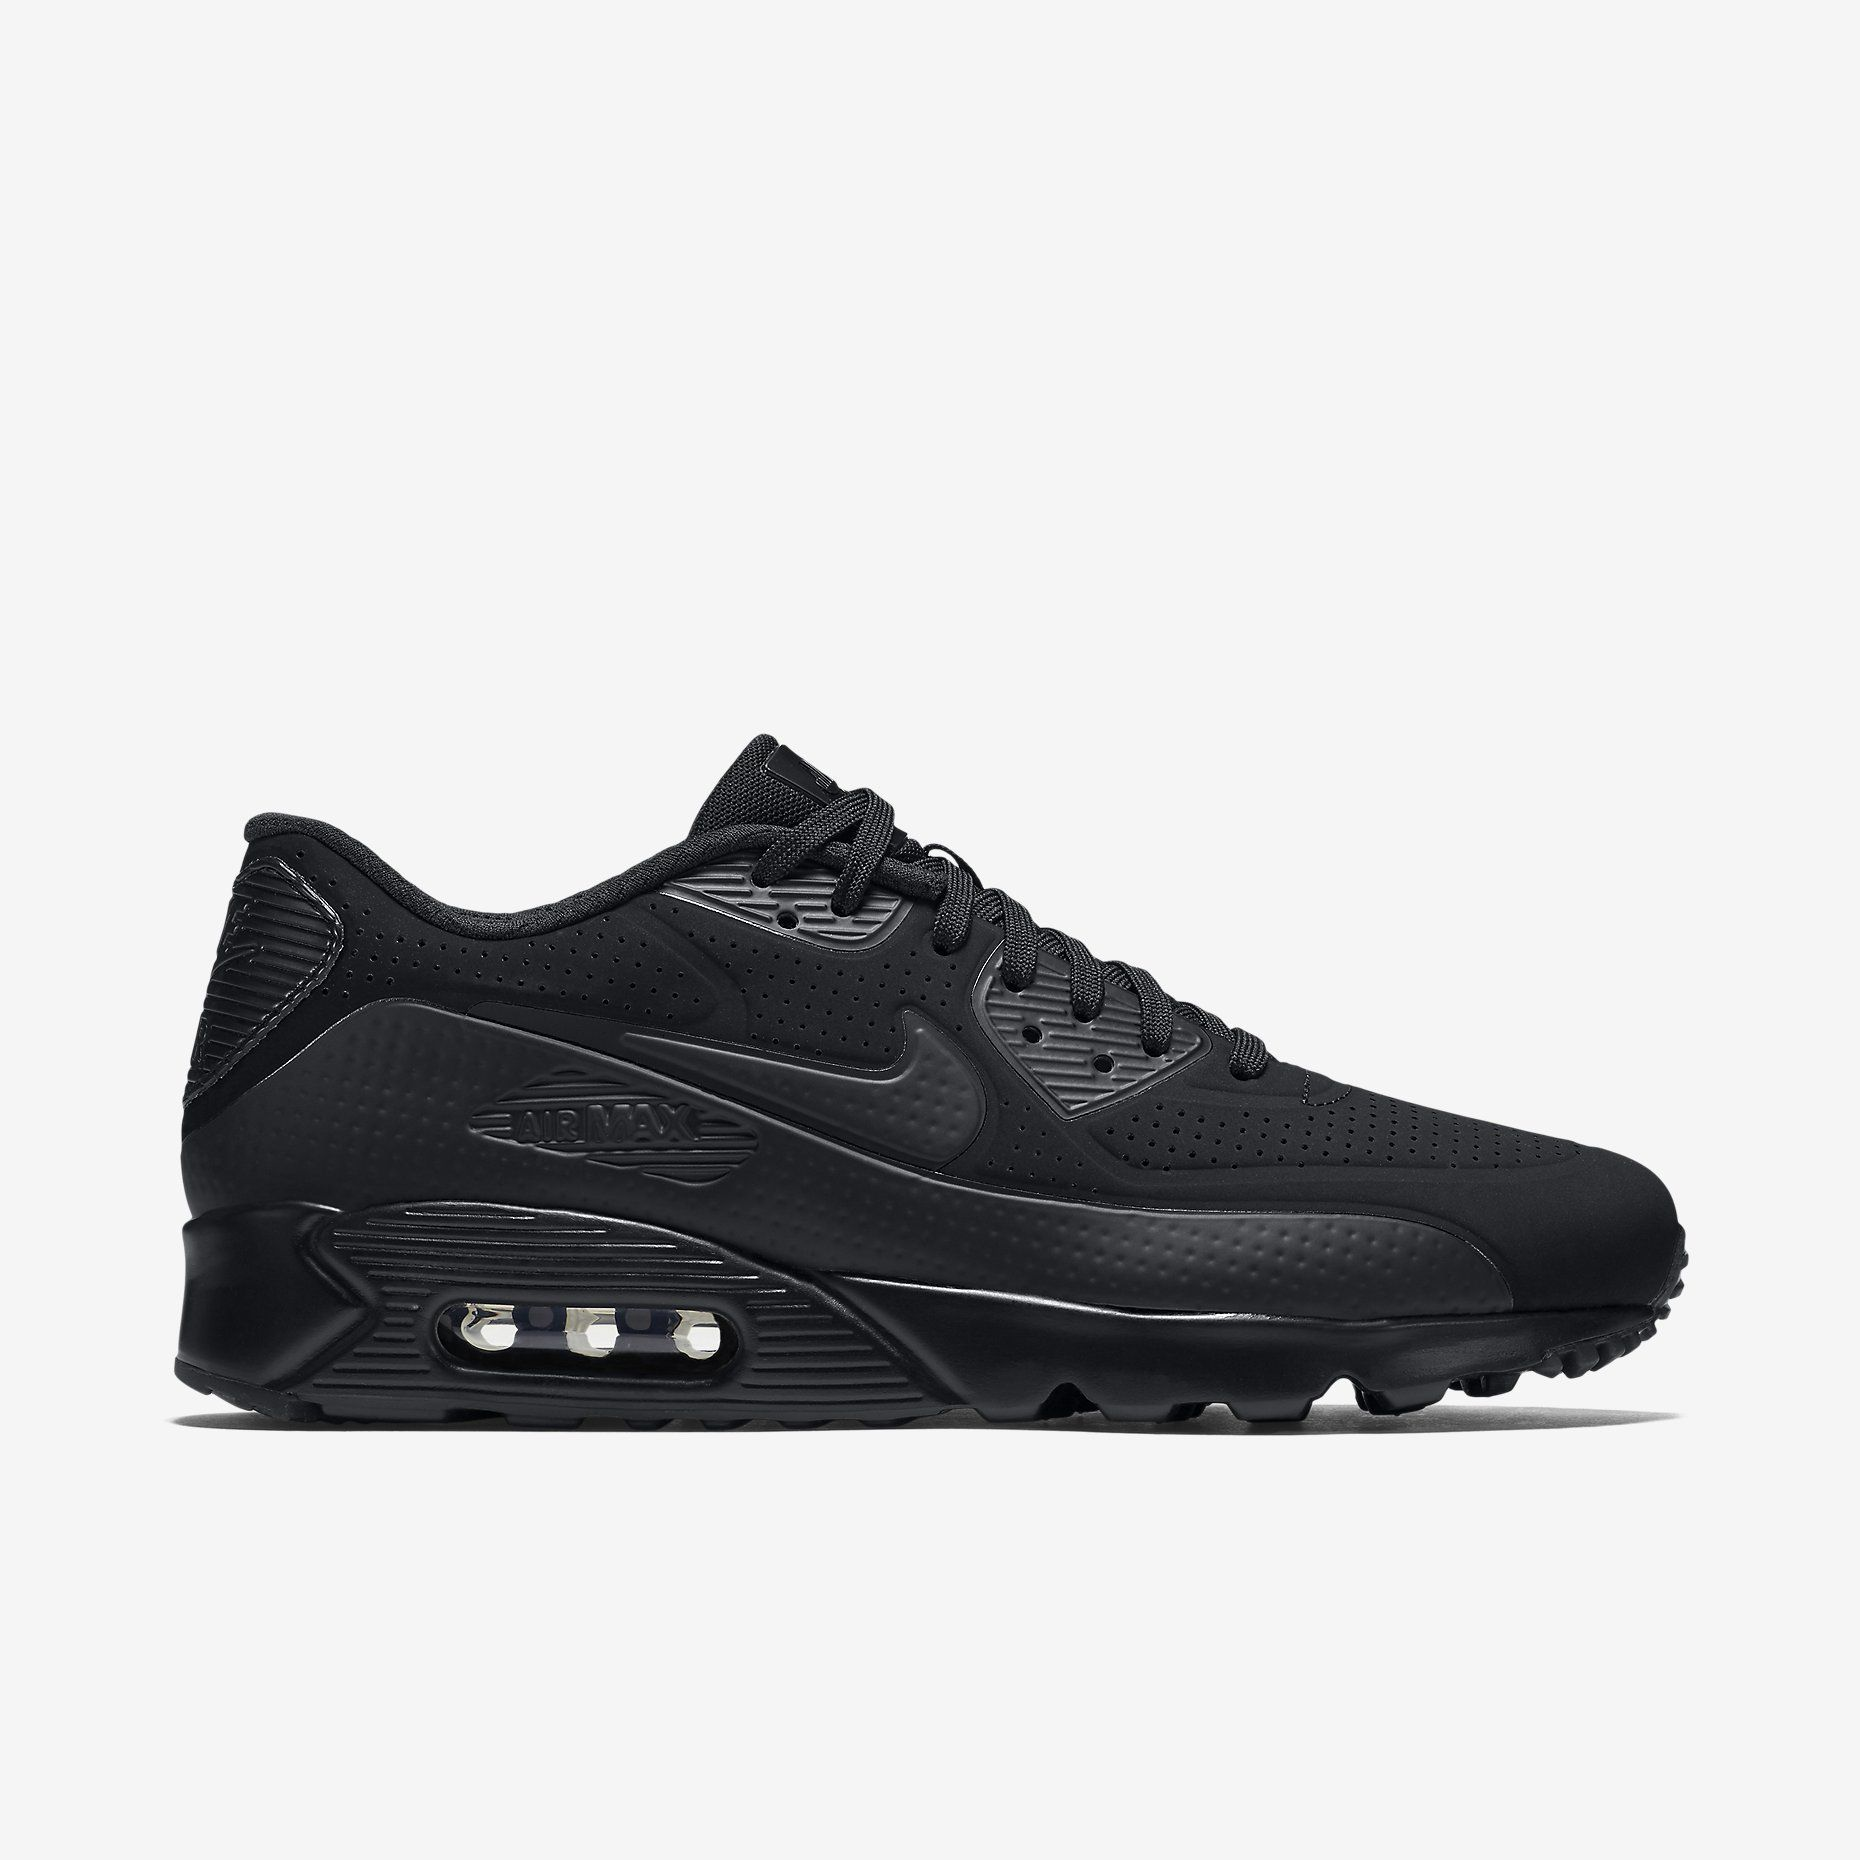 ab752553a2 Nike Air Max 90 Ultra Moire Men's Shoe. Nike.com (NL) | Nike shoes ...